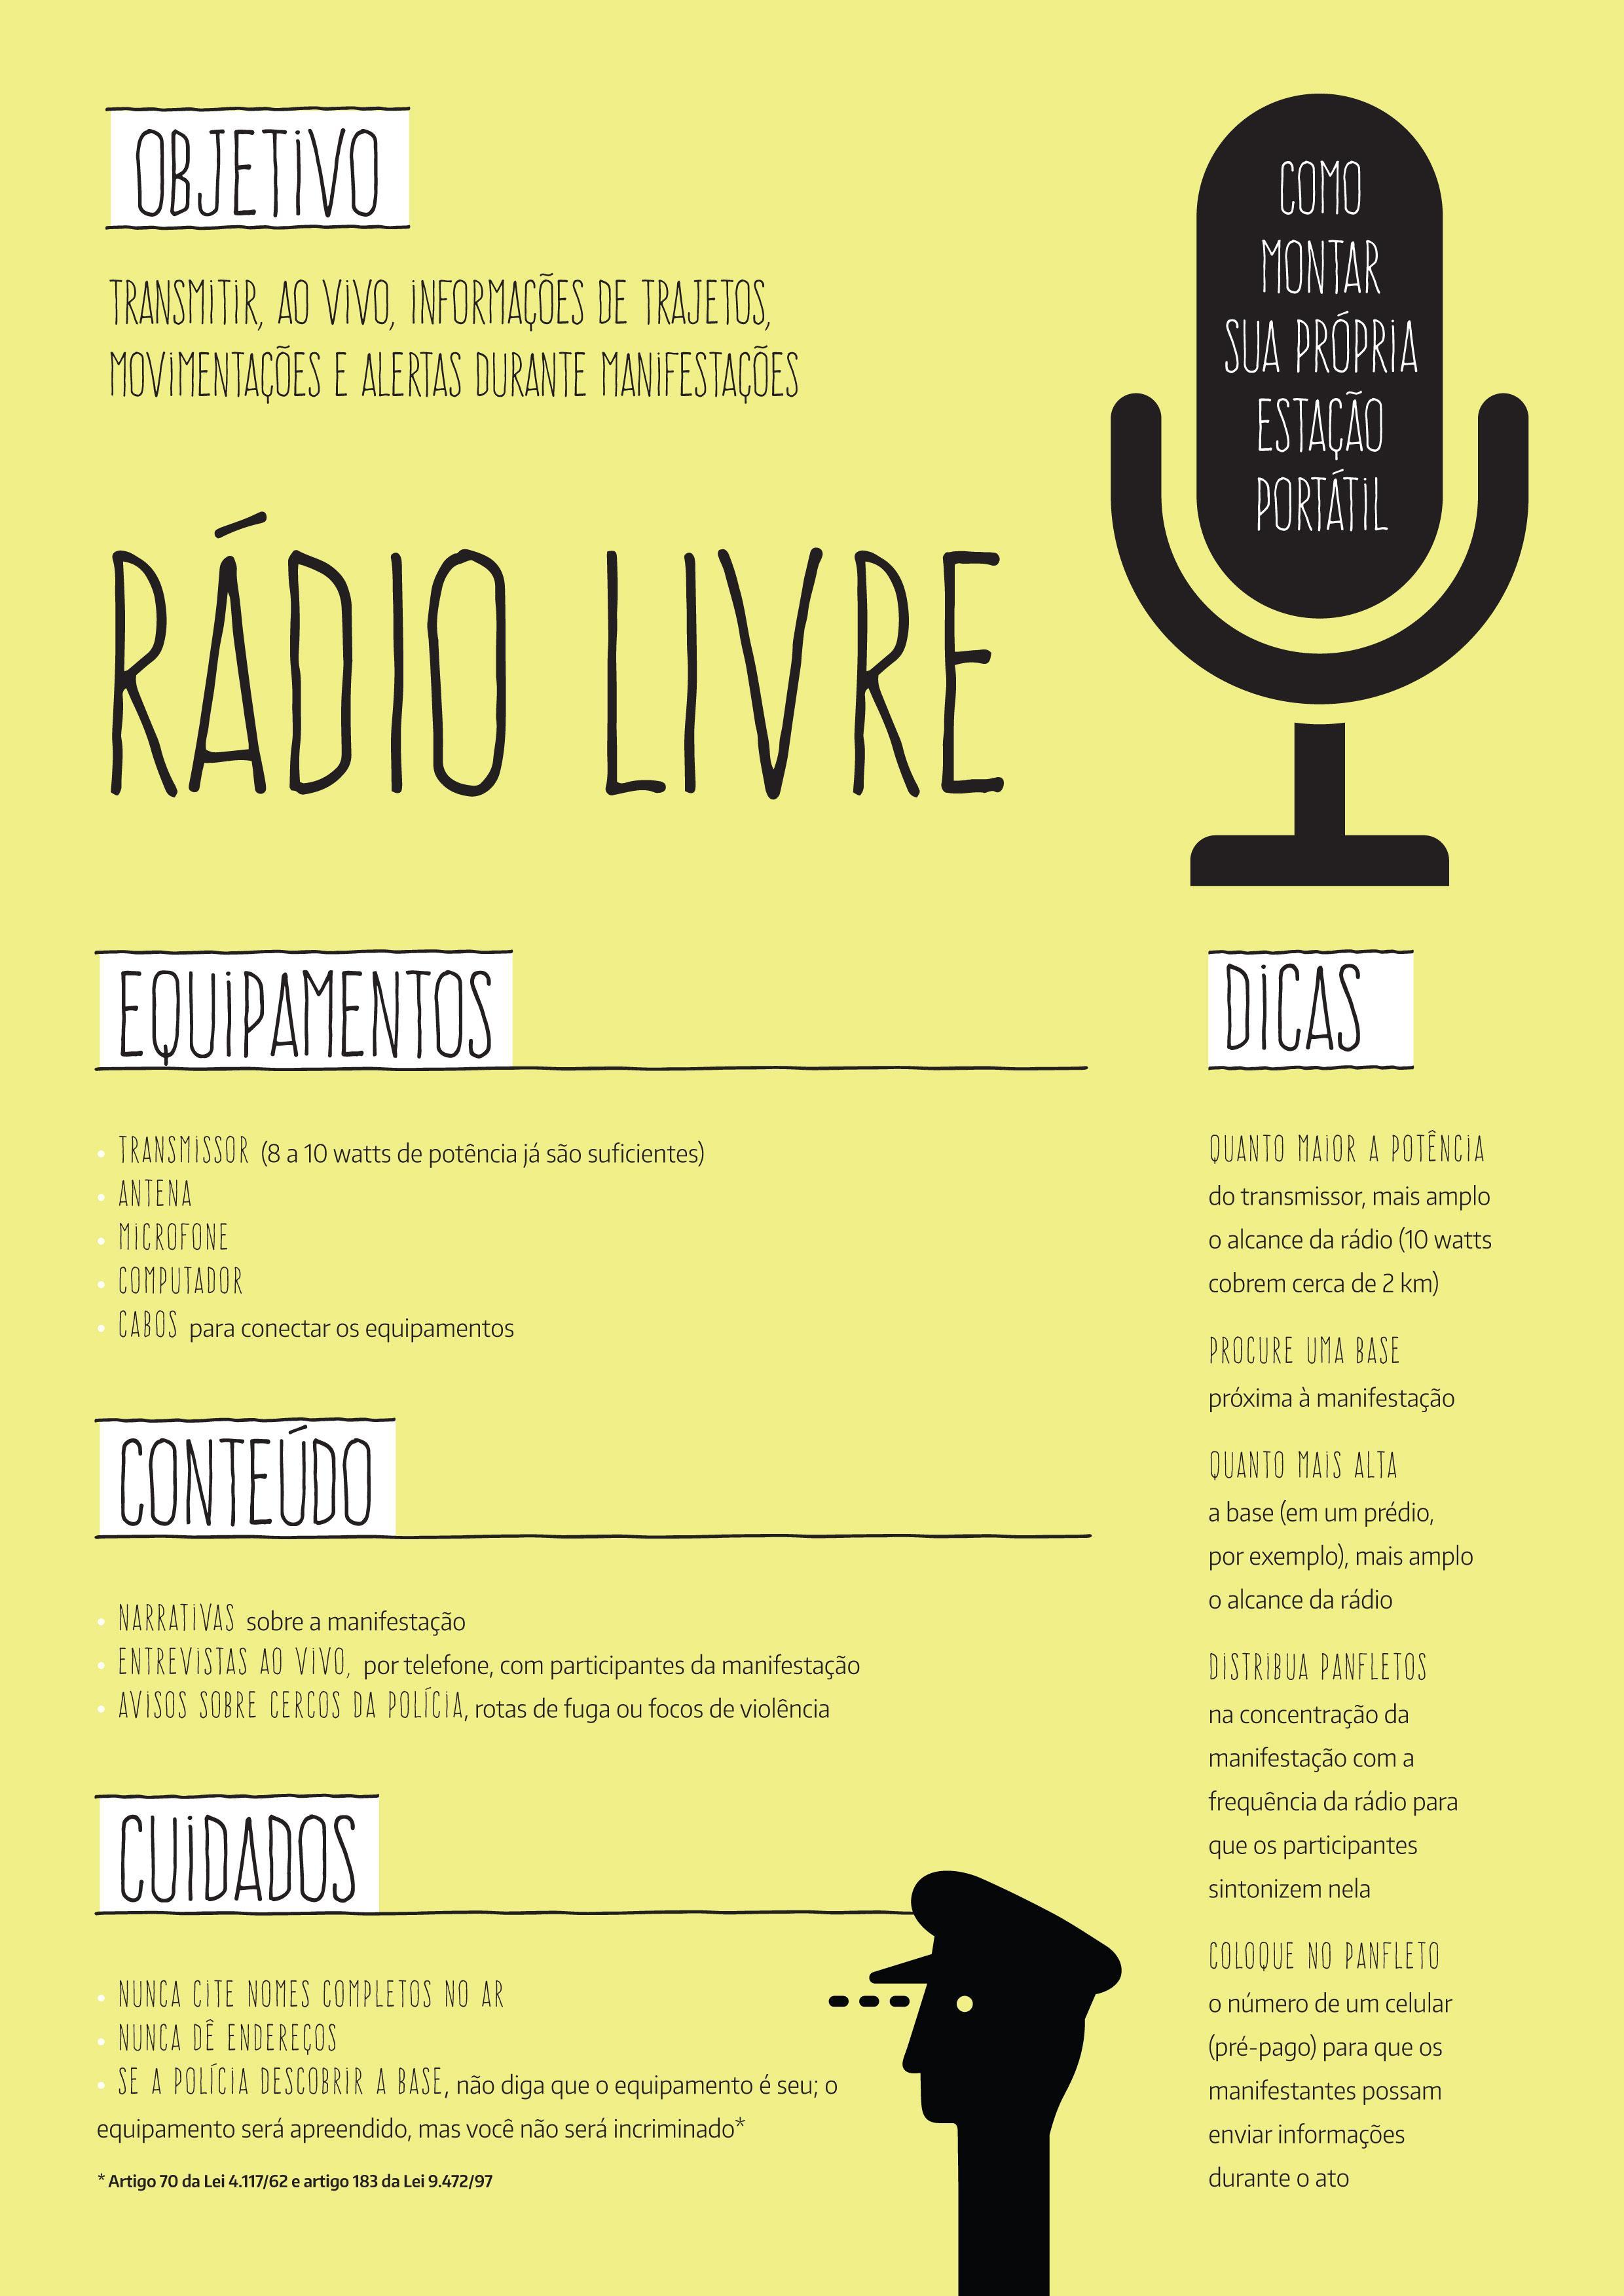 Rádio Livre